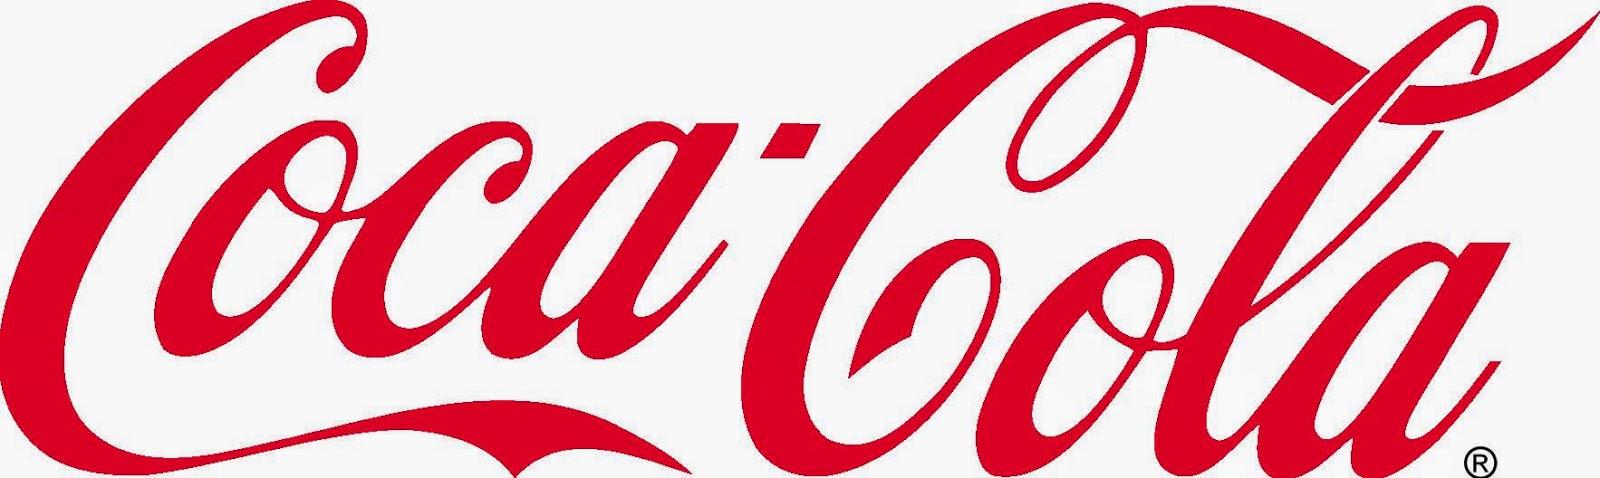 Coca-Cola BritMums Live! 2014, Coca-Cola Share a Coke campaign 2014, Coca-Cola sponsor 2014 FIFA World Cup